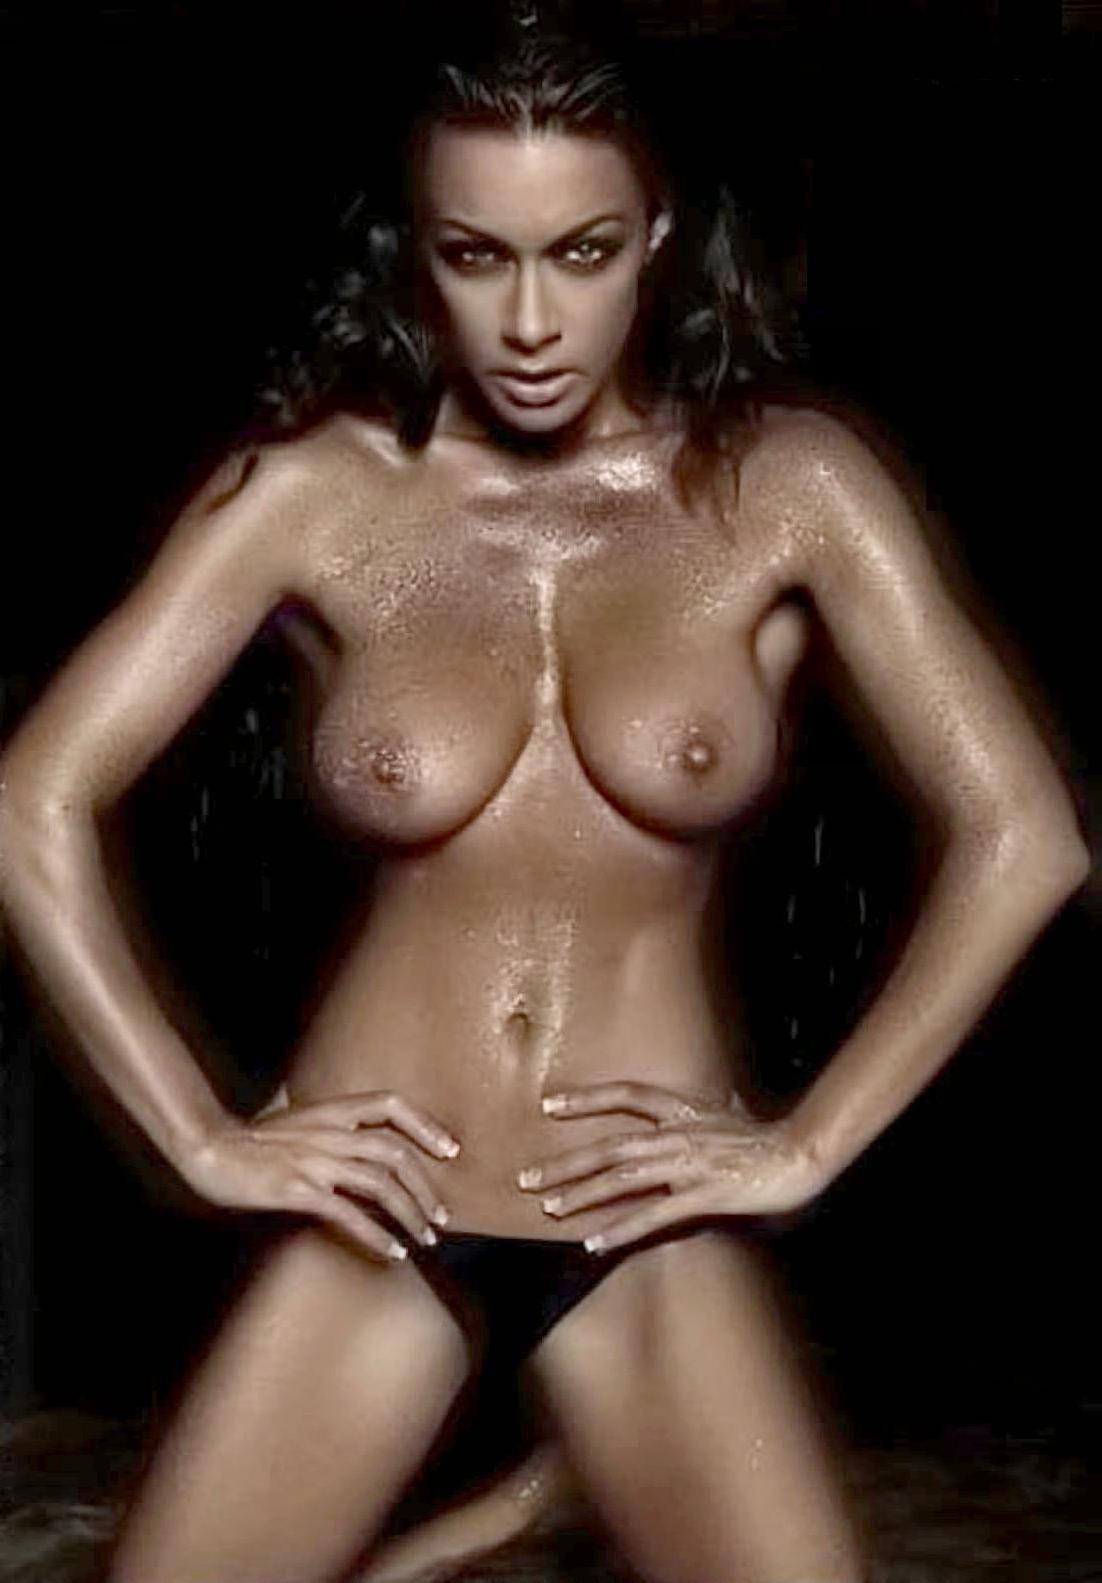 melita-toniolo-bondage-pics-flashing-boobies-by-a-sign-pictures